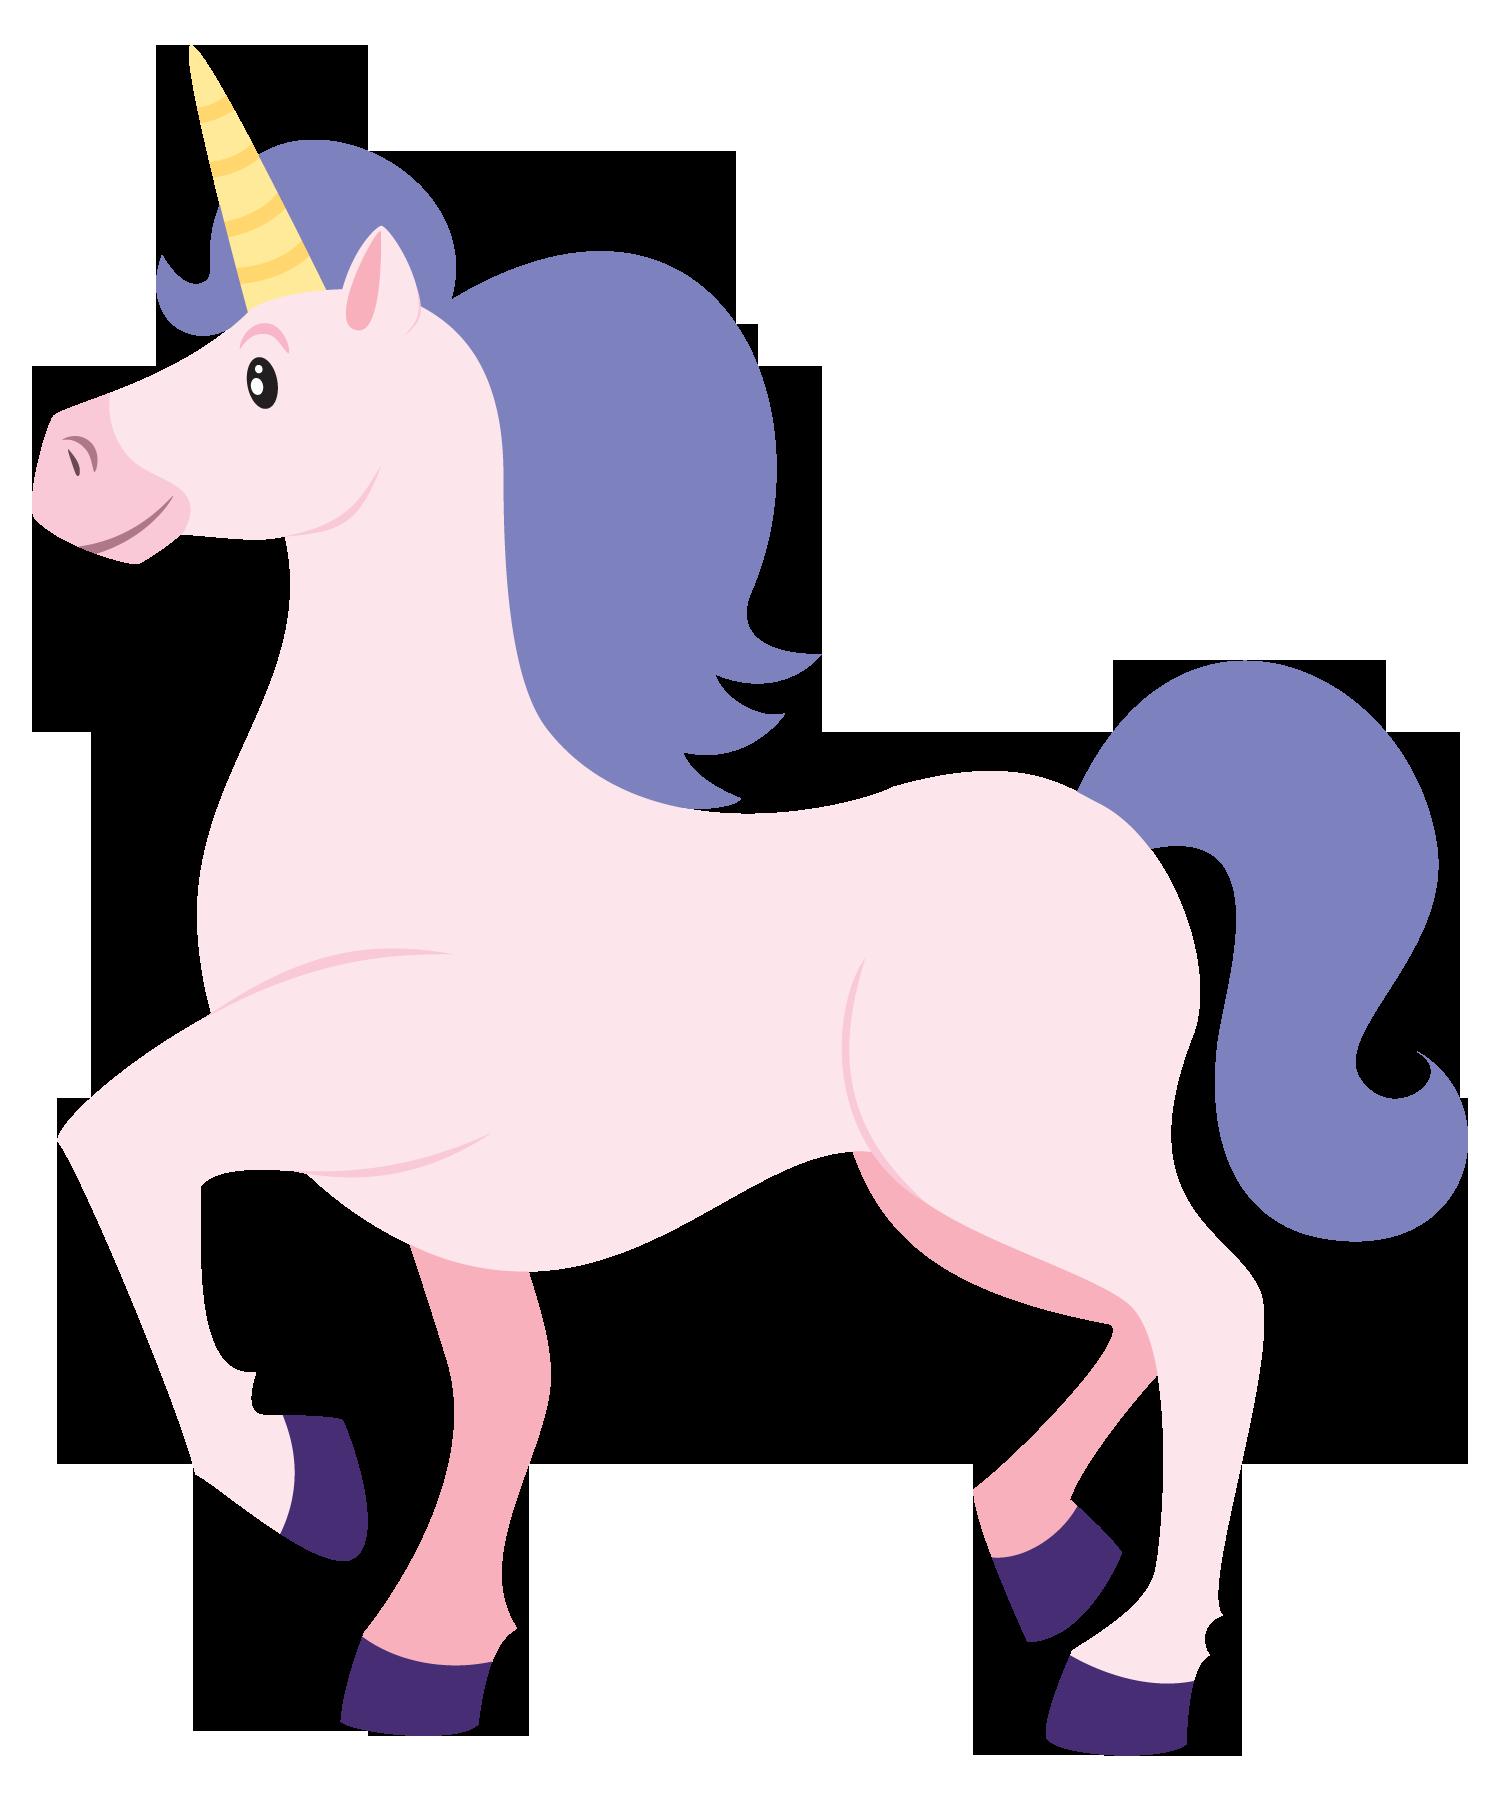 Outline clipart unicorn. Clip art this cute